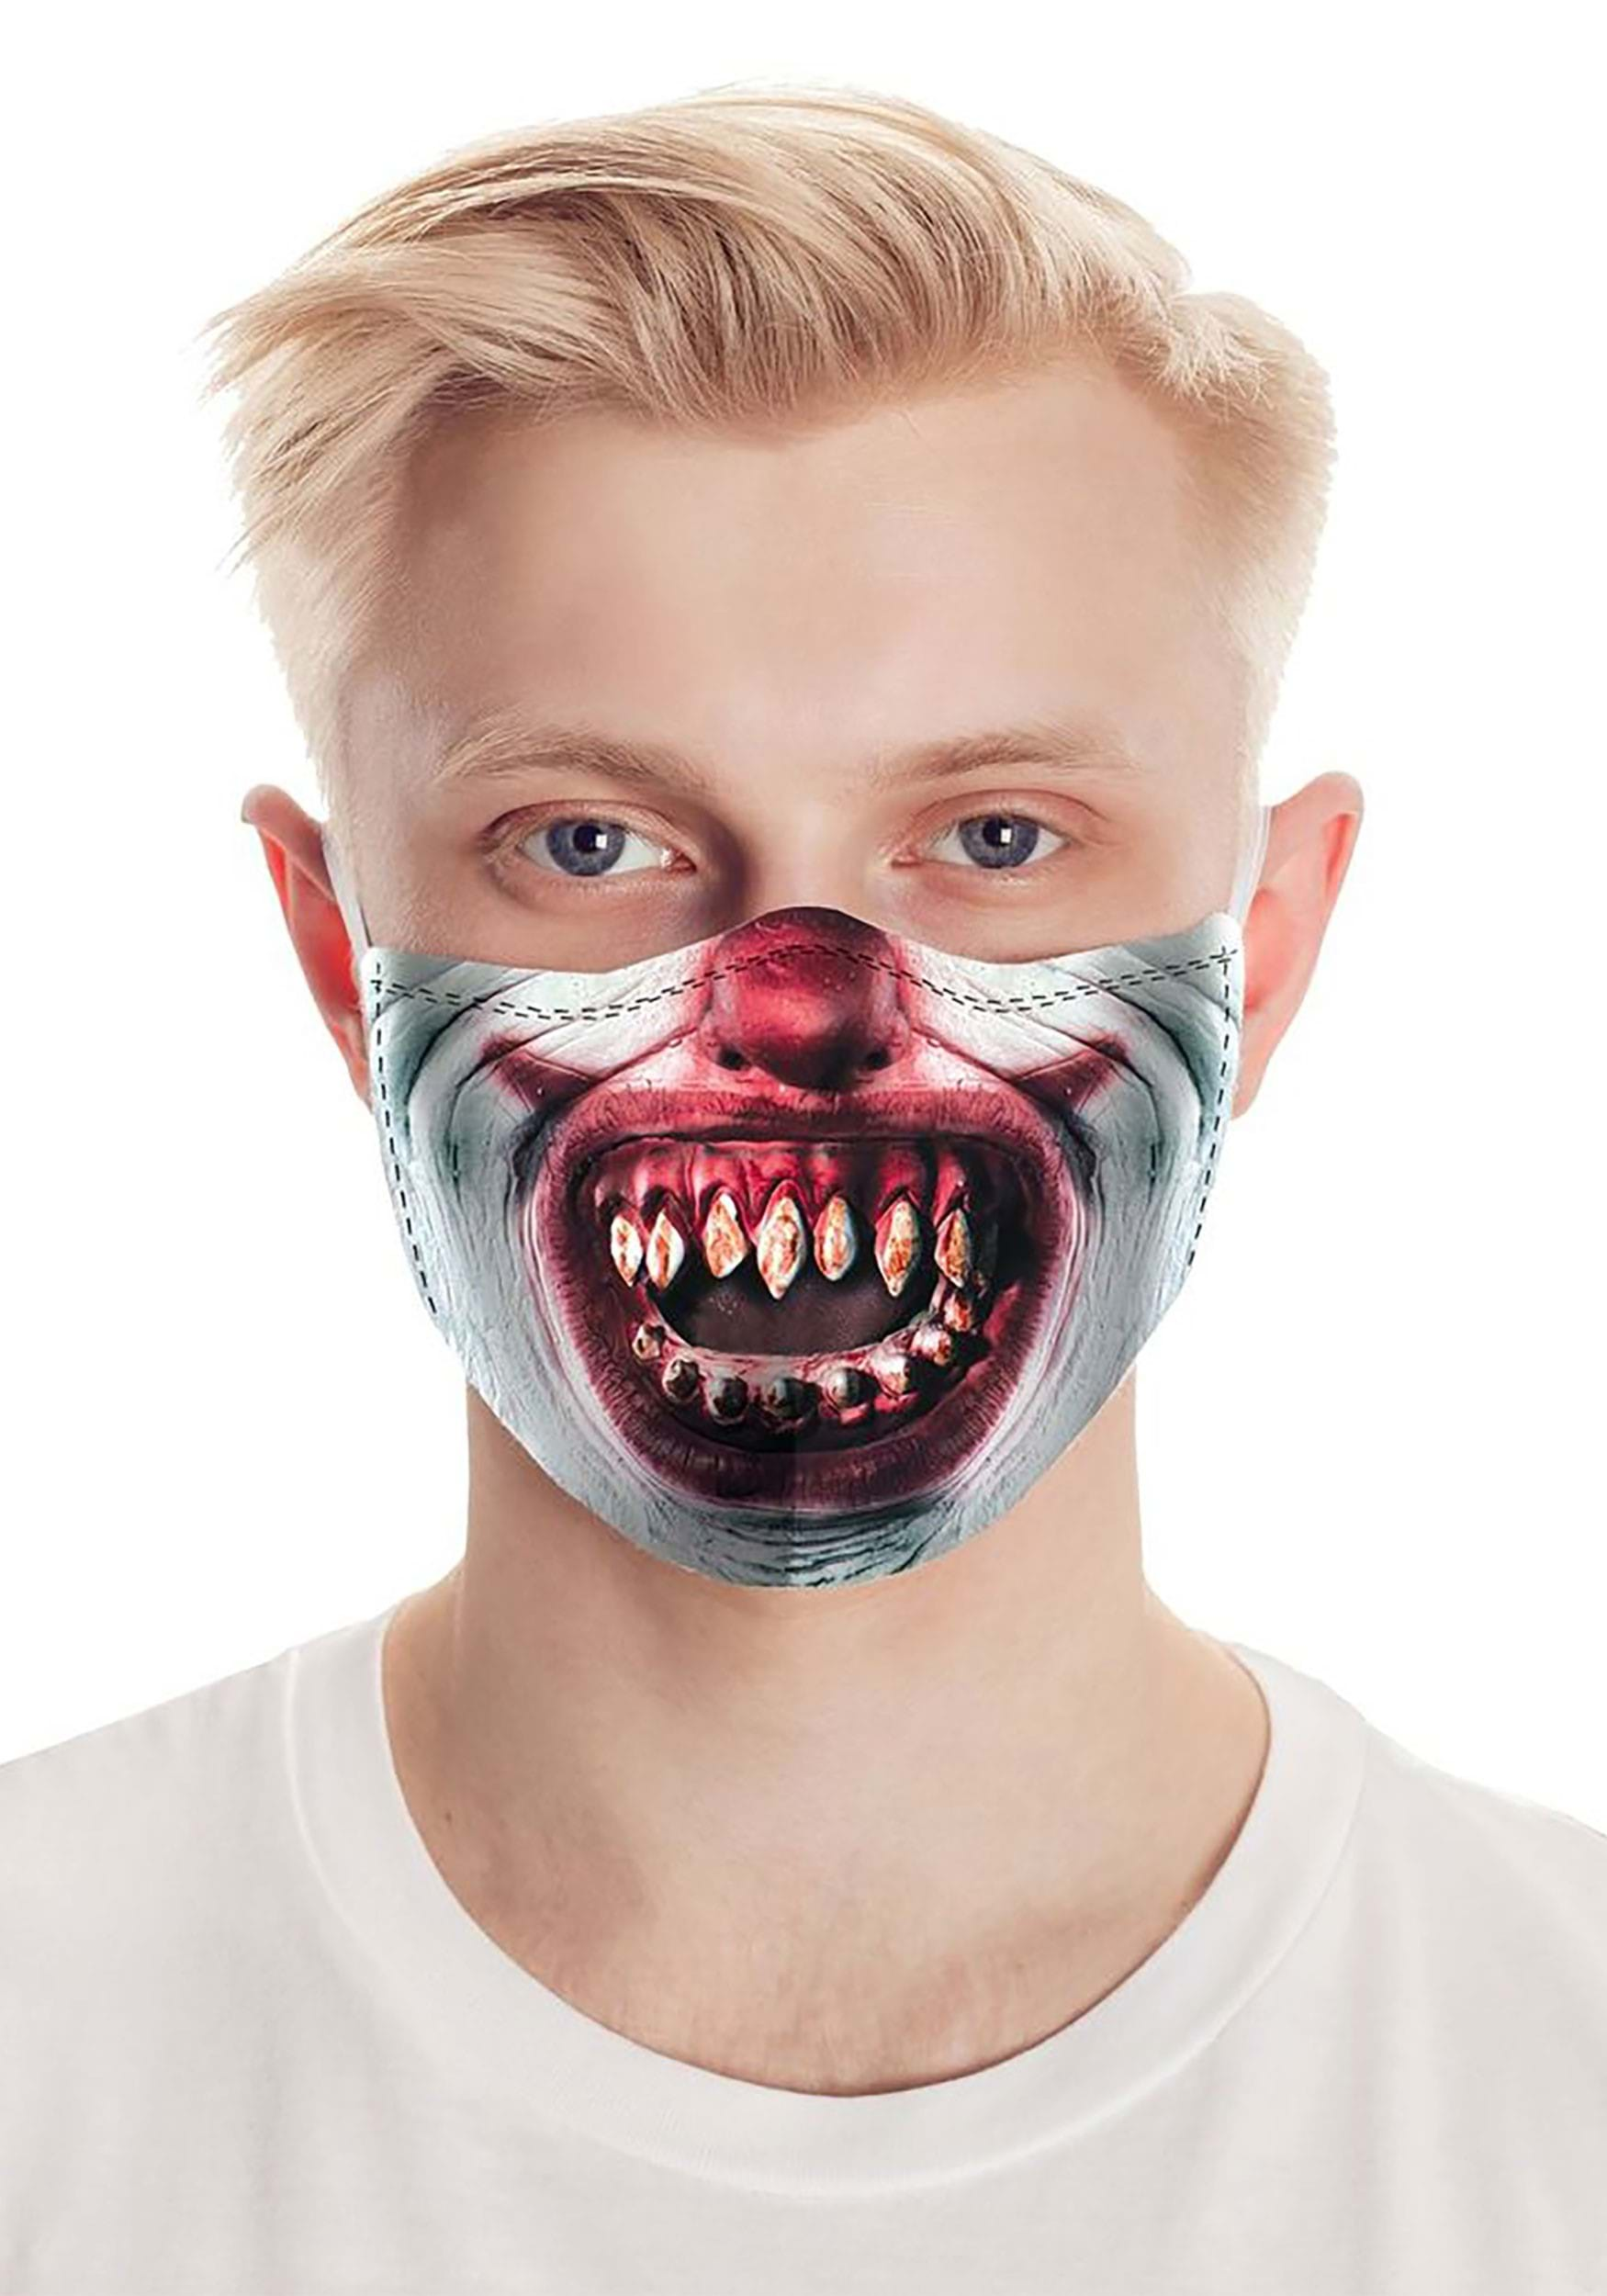 Razor Teeth | Clown Face Mask